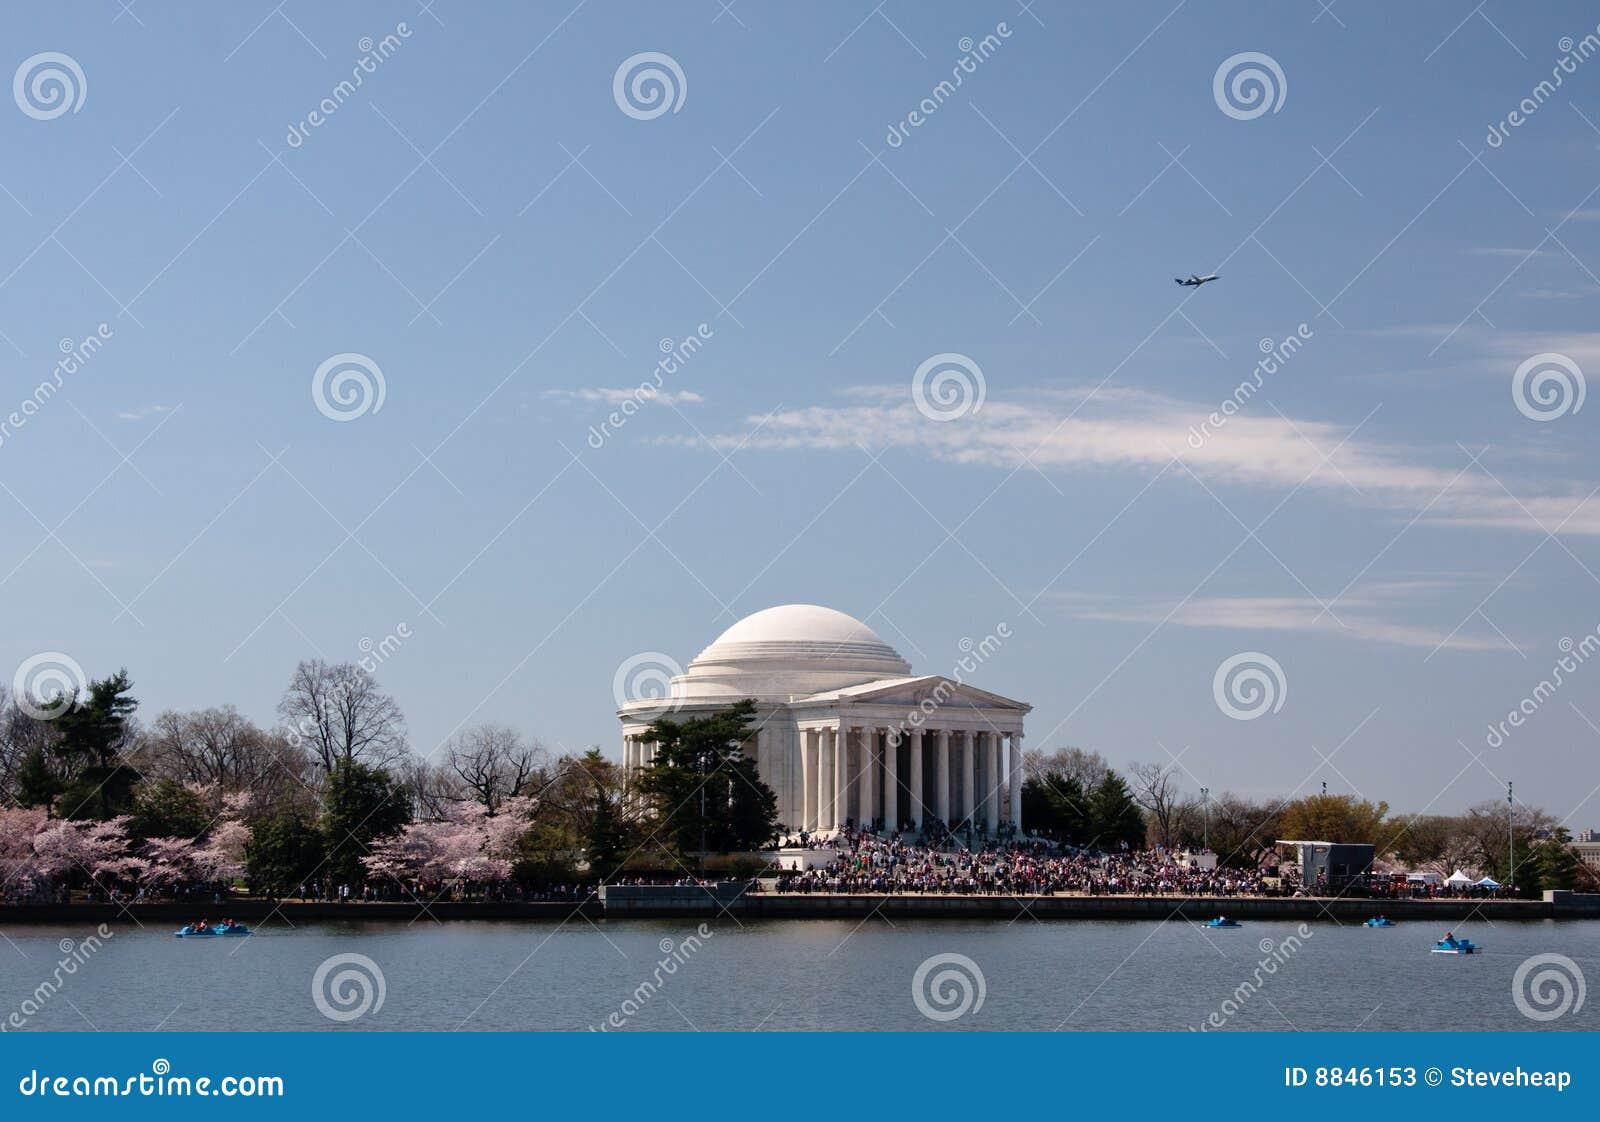 Plane taking off over Jefferson Memorial